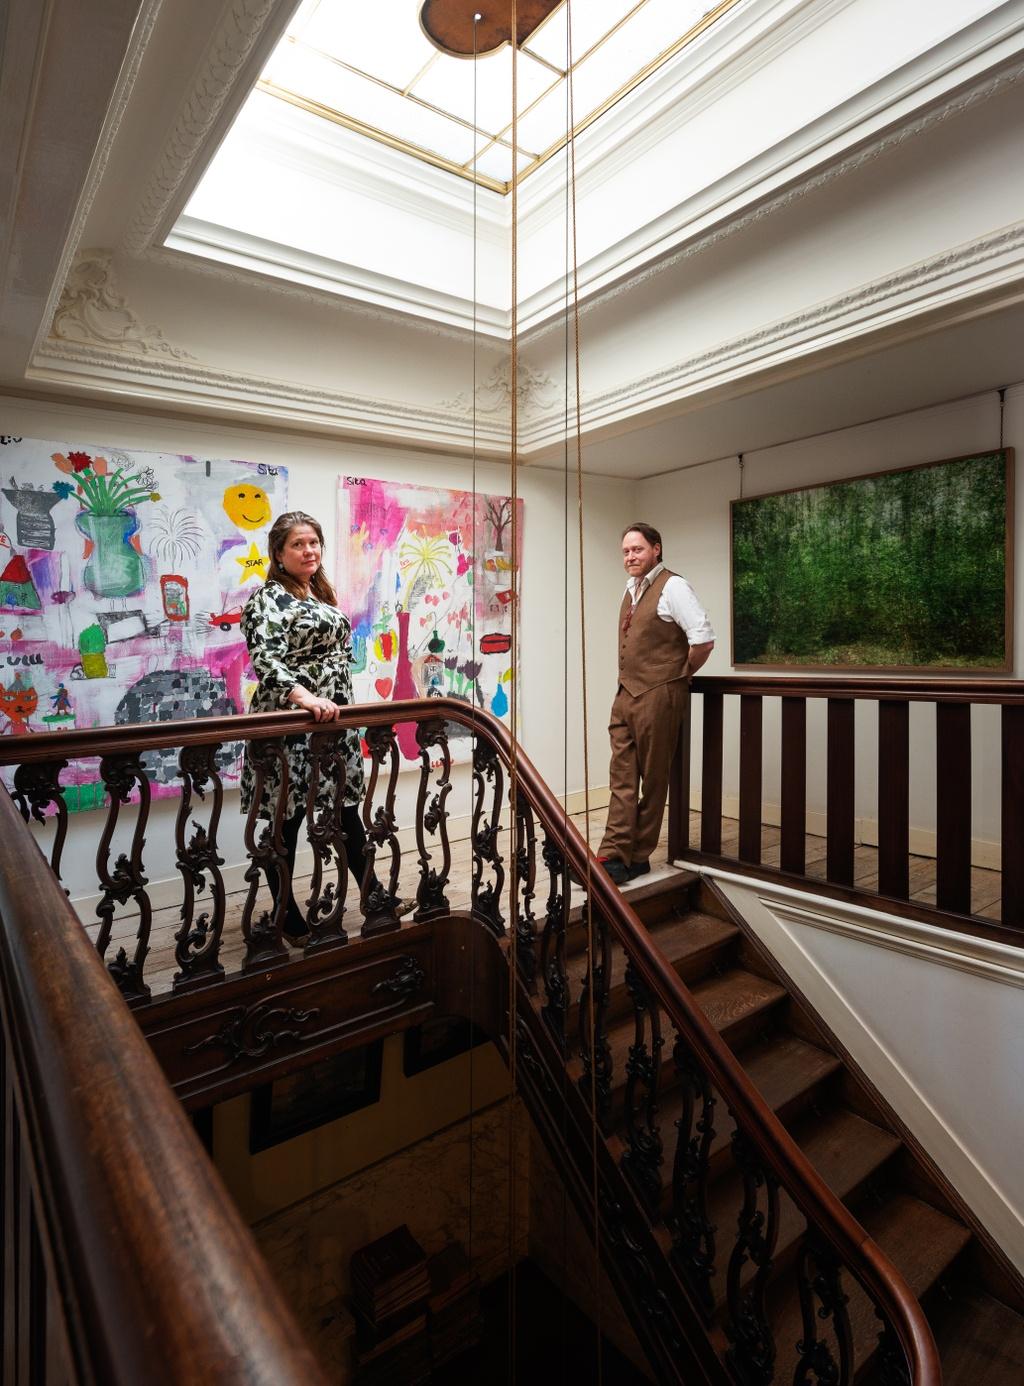 Niels de Boer Kunsthandel P. de Boer   TEFAF Living with Art   The European Fine Art Foundation